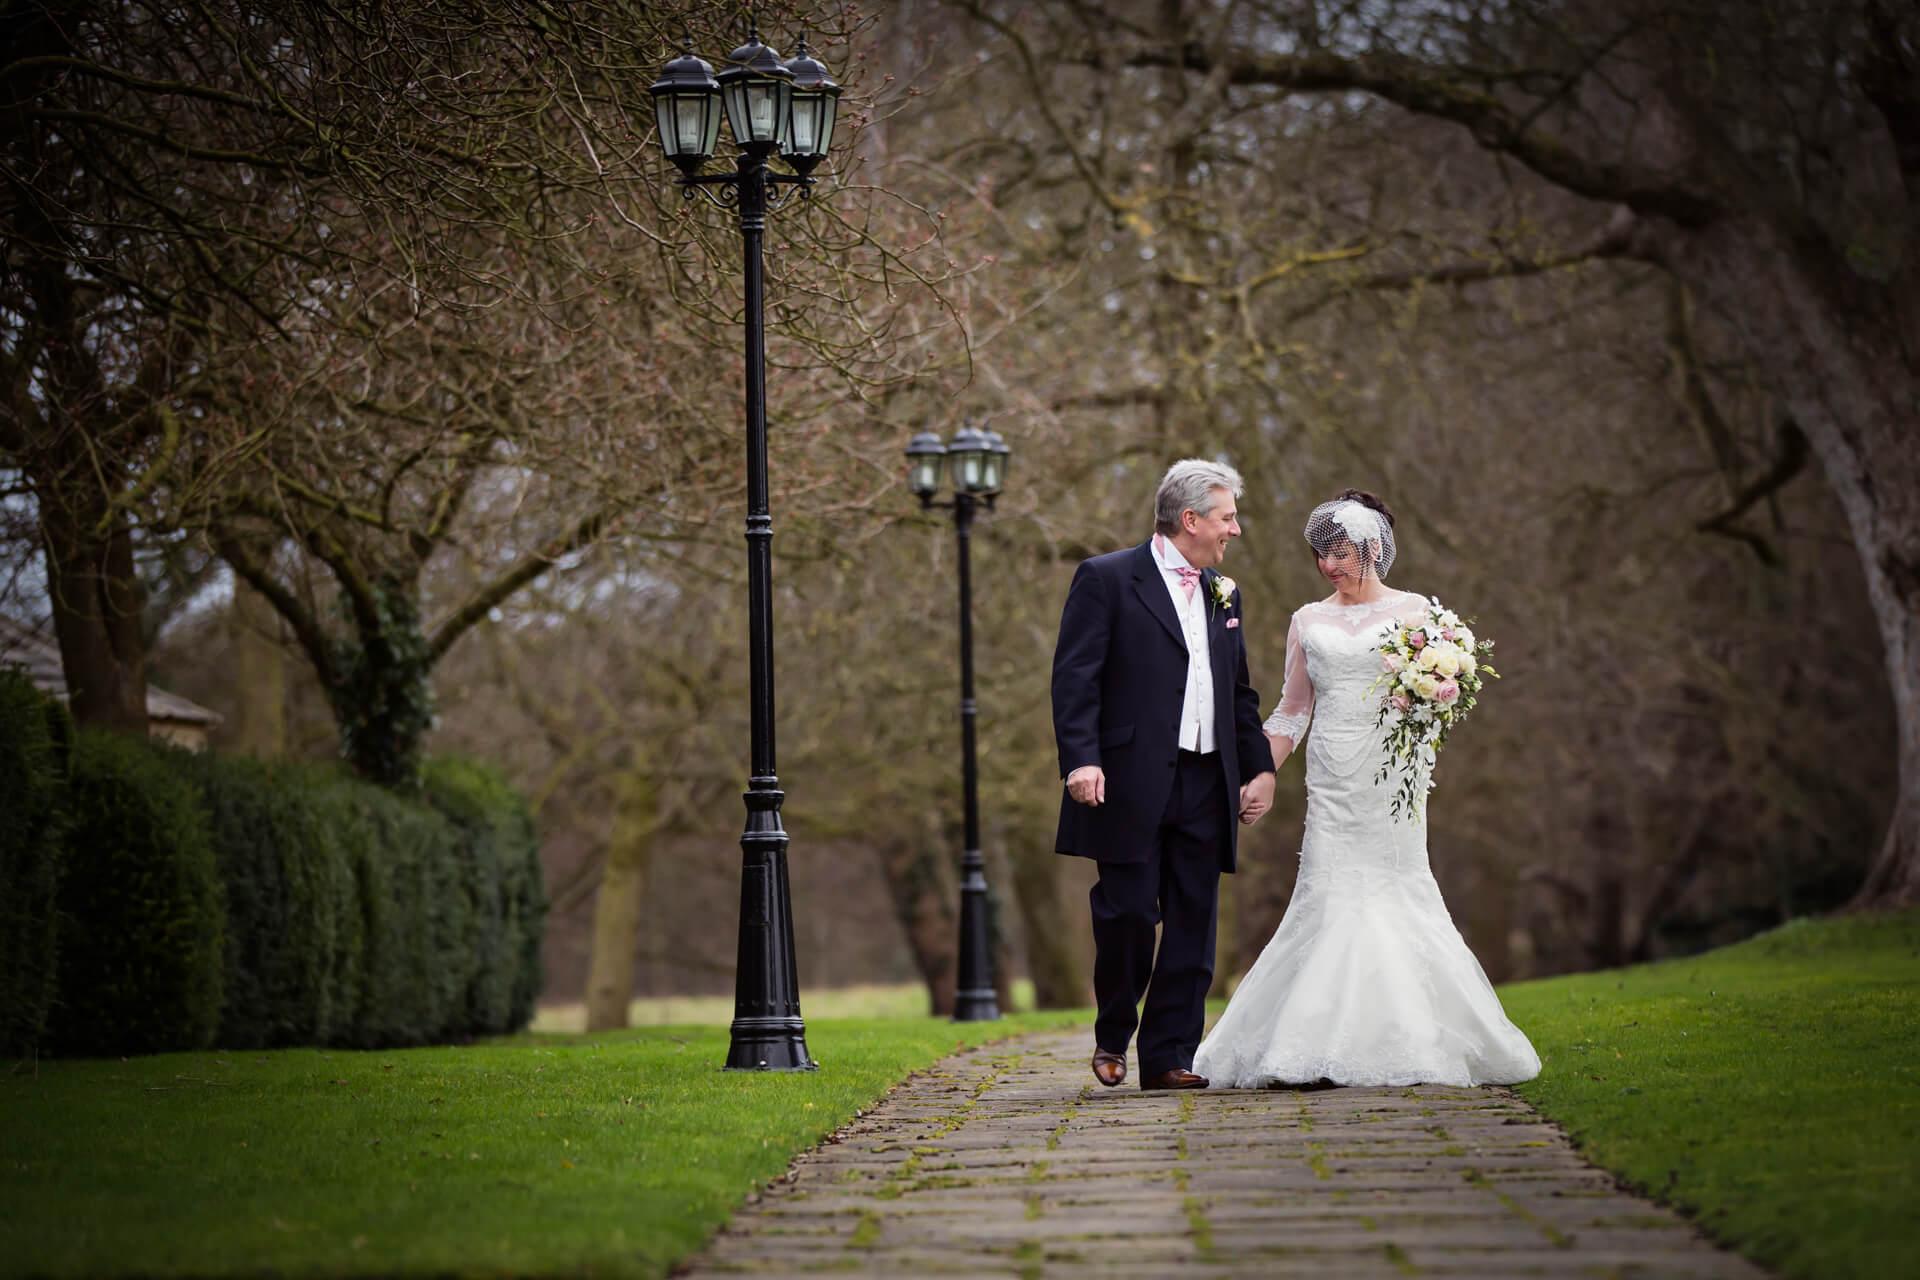 Hazlewood Castle wedding photographer - bride and groom walking in the castle grounds